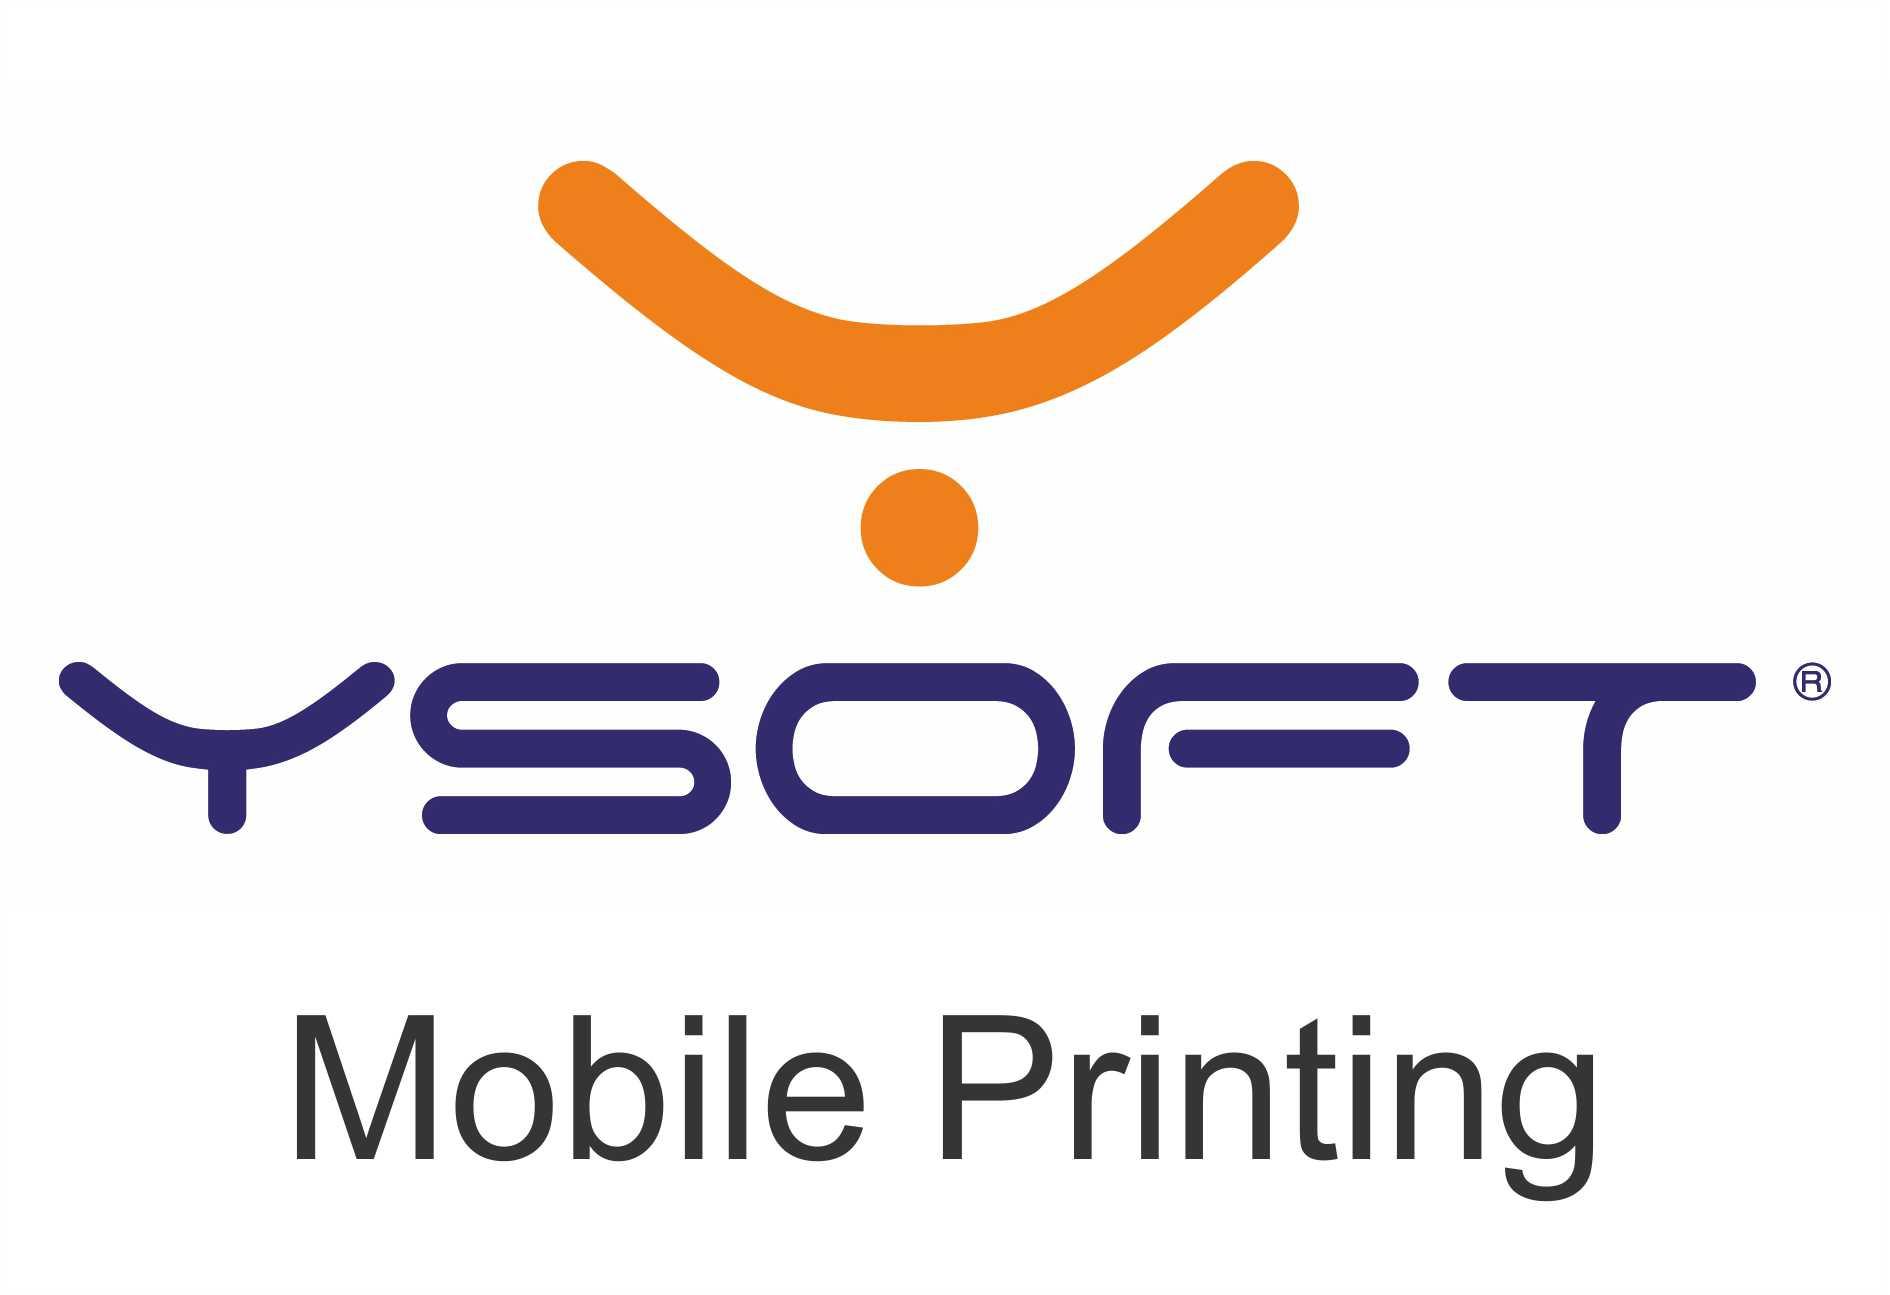 ysoft-mobile-printing